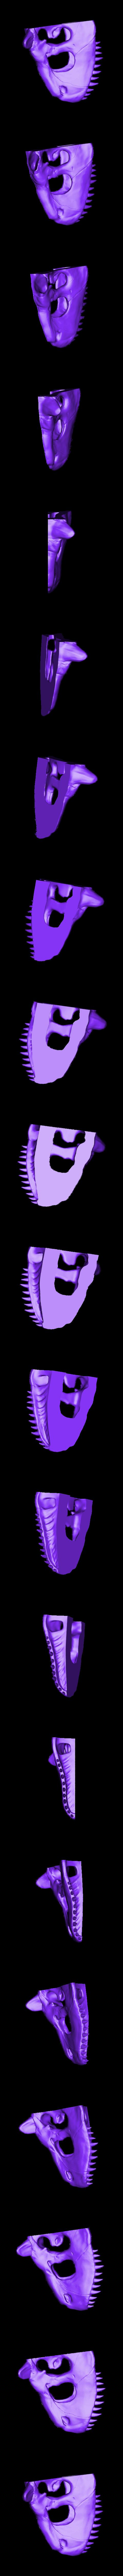 e0acbfdc1c5917441679bf09c5bc6400fa537f7f.stl Download free STL file Dinosaur Skull • 3D printing template, LordLilapause